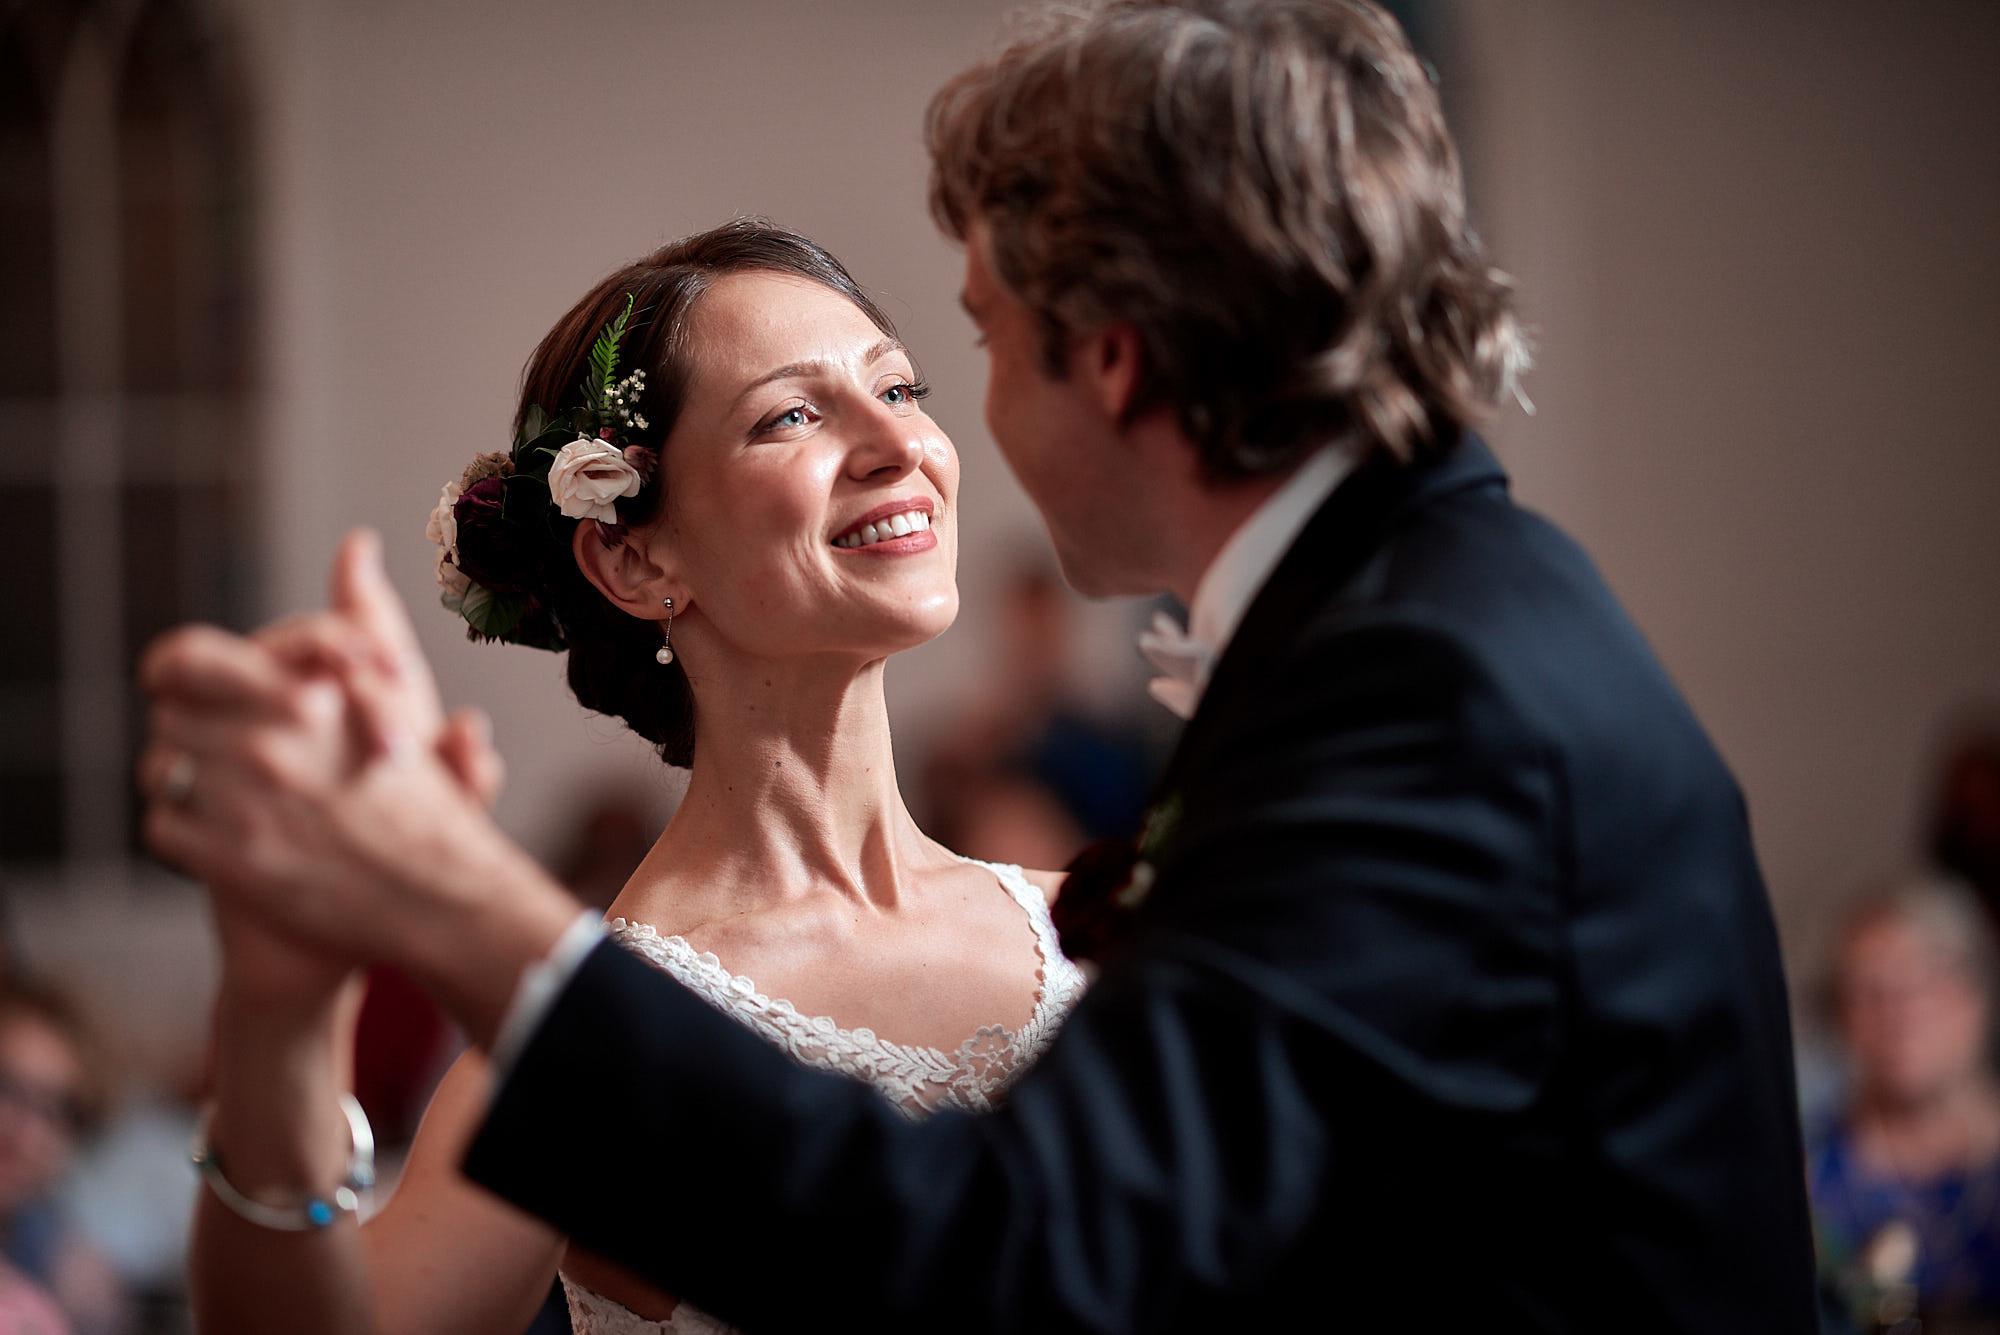 Emily & Peter's First Dance - Mercury Hall Wedding, Austin Texas